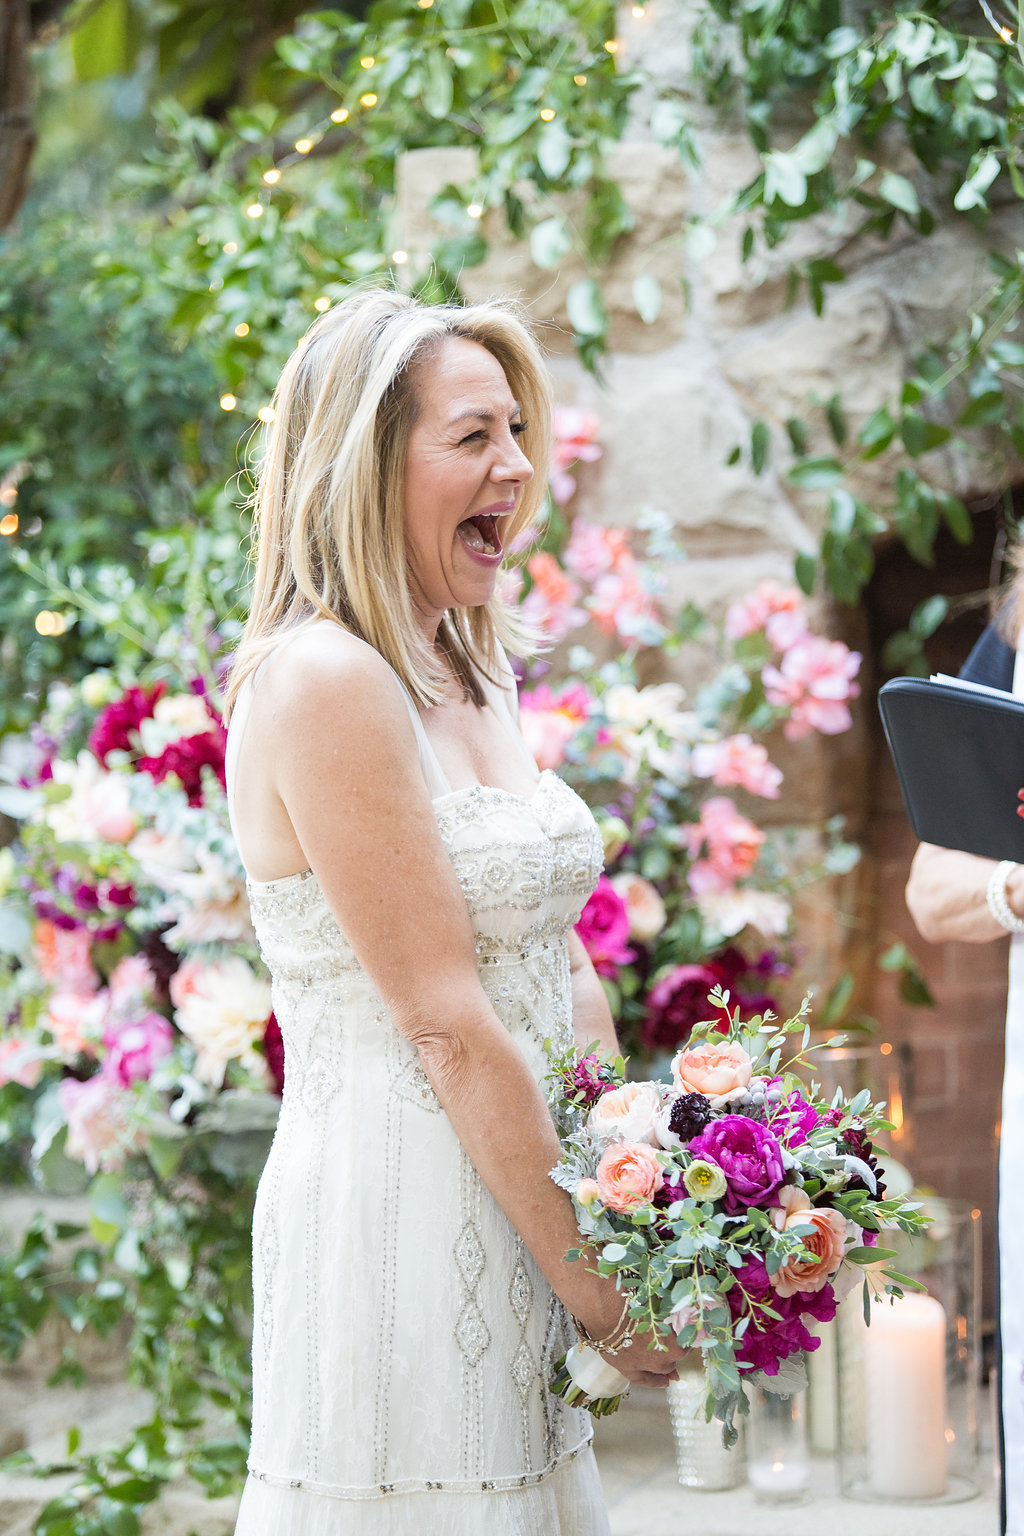 SantaBarbaraWeddingStyle.com | Barbra Mosouris | Cody Floral | San Ysidro Ranch | Elopement | Melissa Musgrove | Wedding Ceremony Floral | Bride and Groom | Wedding Planning